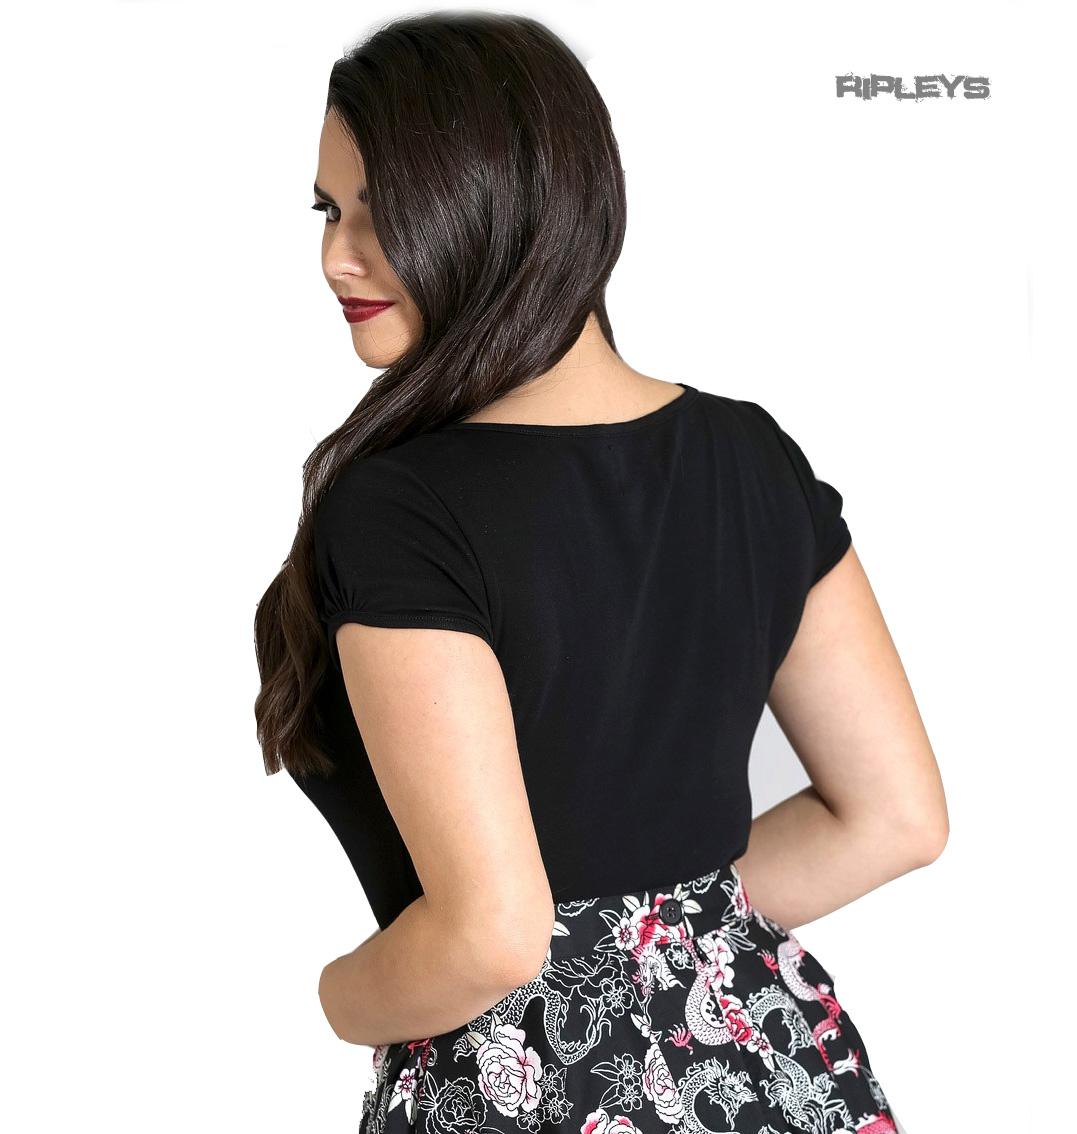 Hell-Bunny-Shirt-50s-Rockabilly-Top-MIA-Plain-Black-Short-Sleeves-All-Sizes thumbnail 16